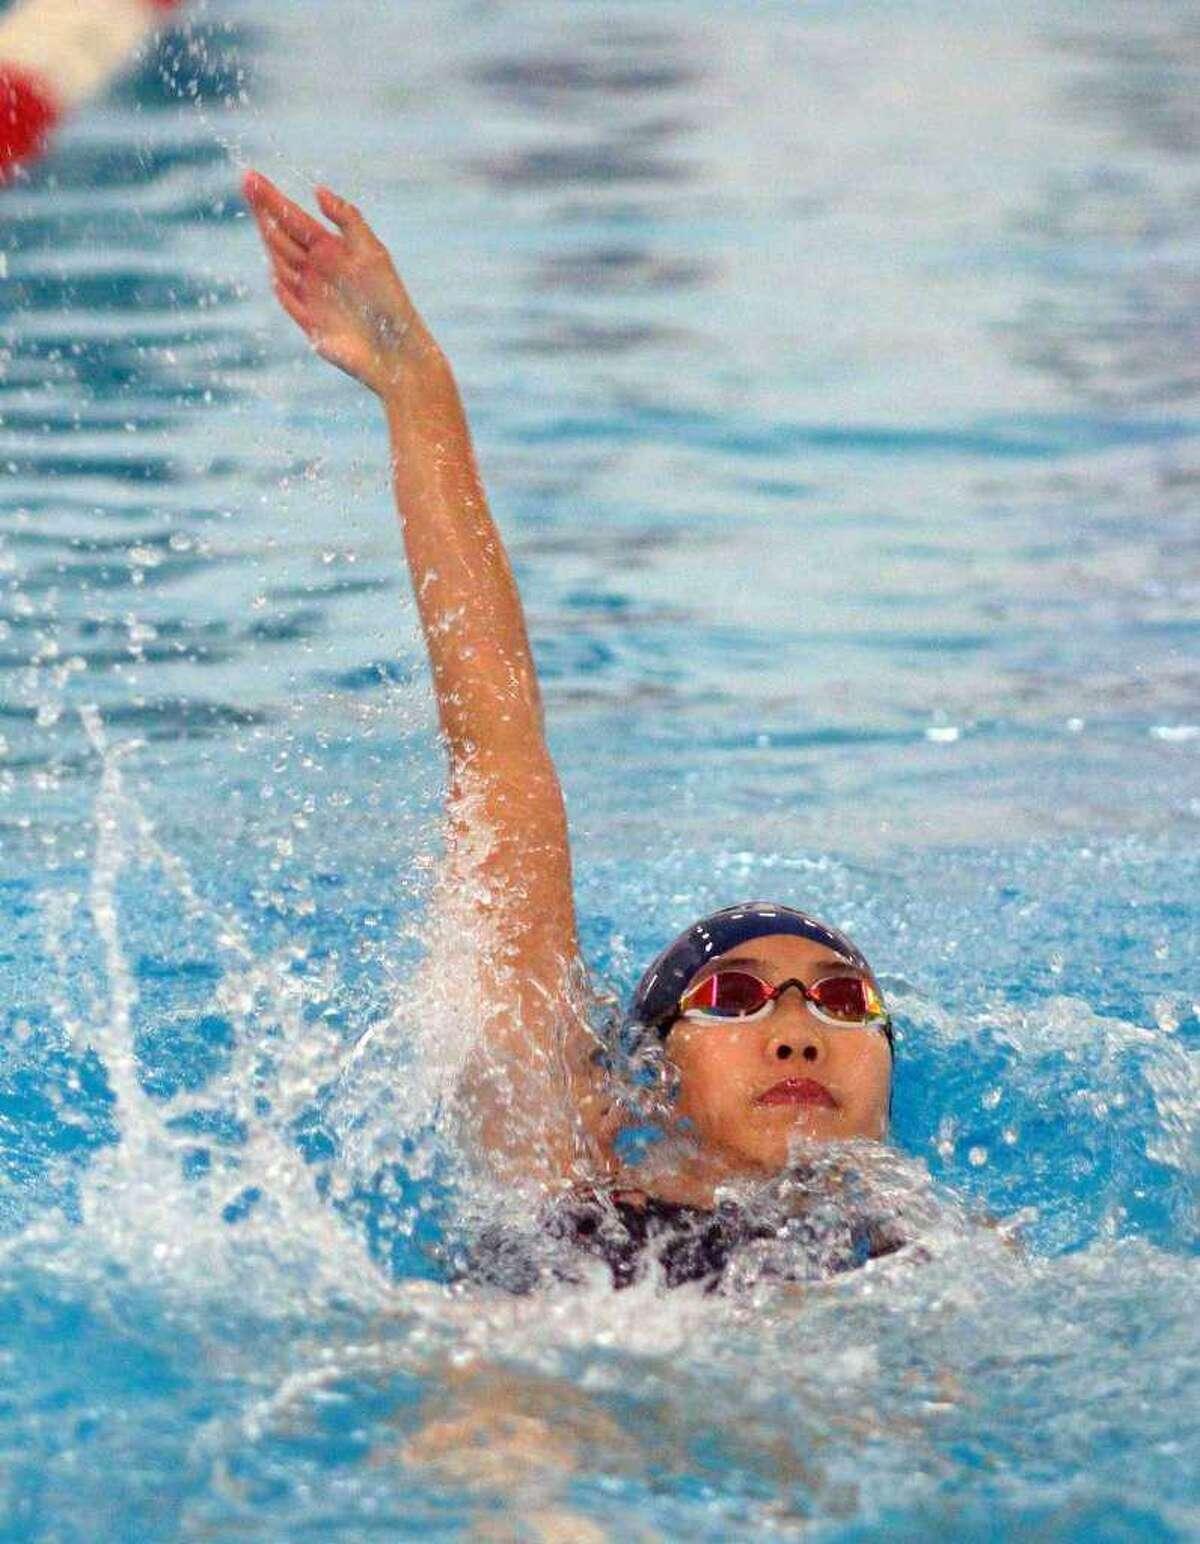 Foran High's Ellen Pan competes in the 100-meter backstroke.